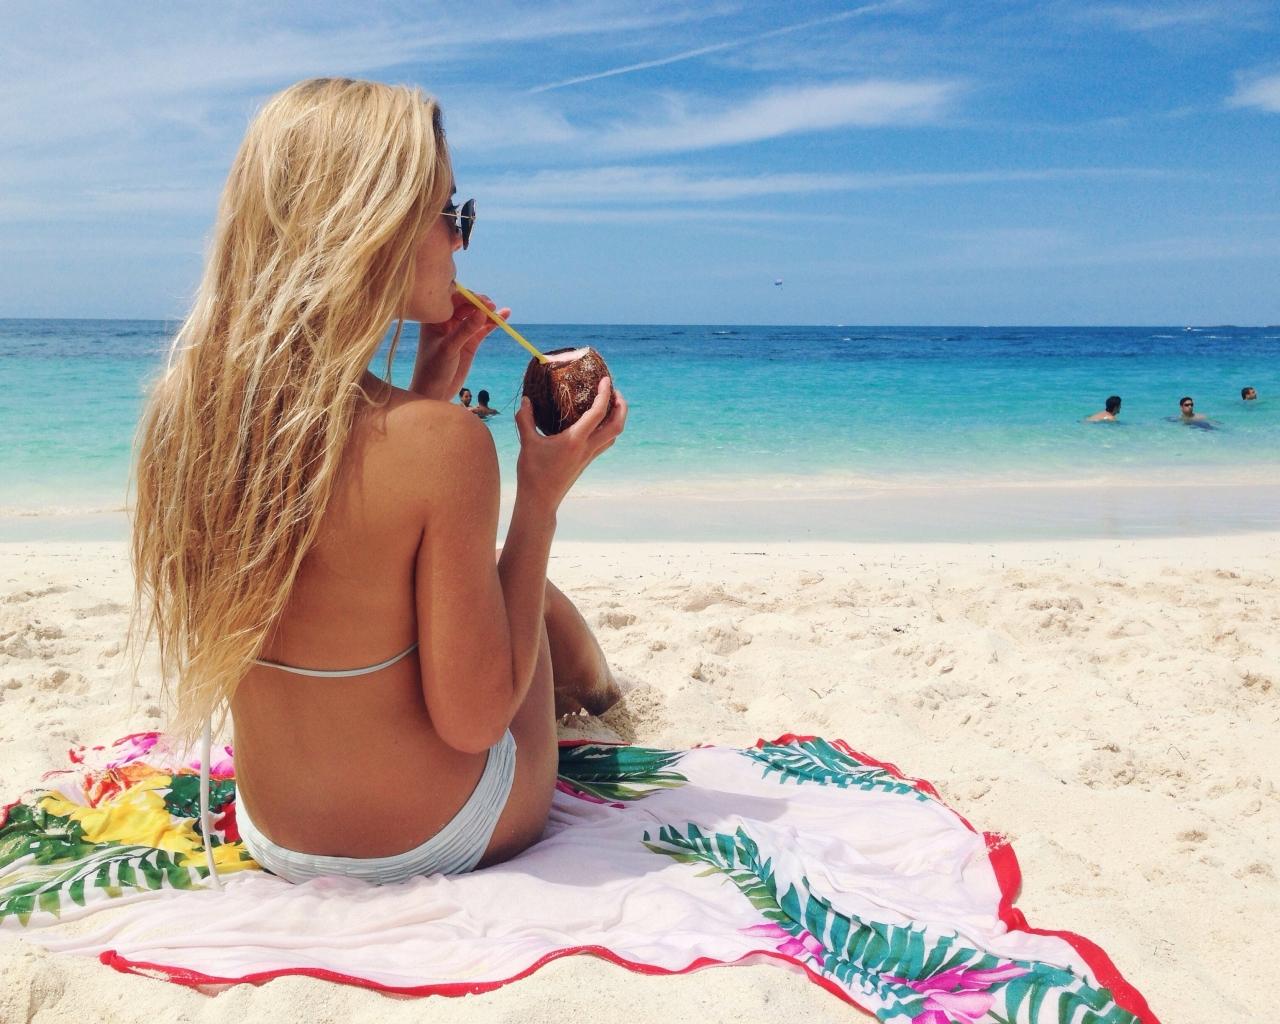 Rubia en bikini en Bahamas - 1280x1024